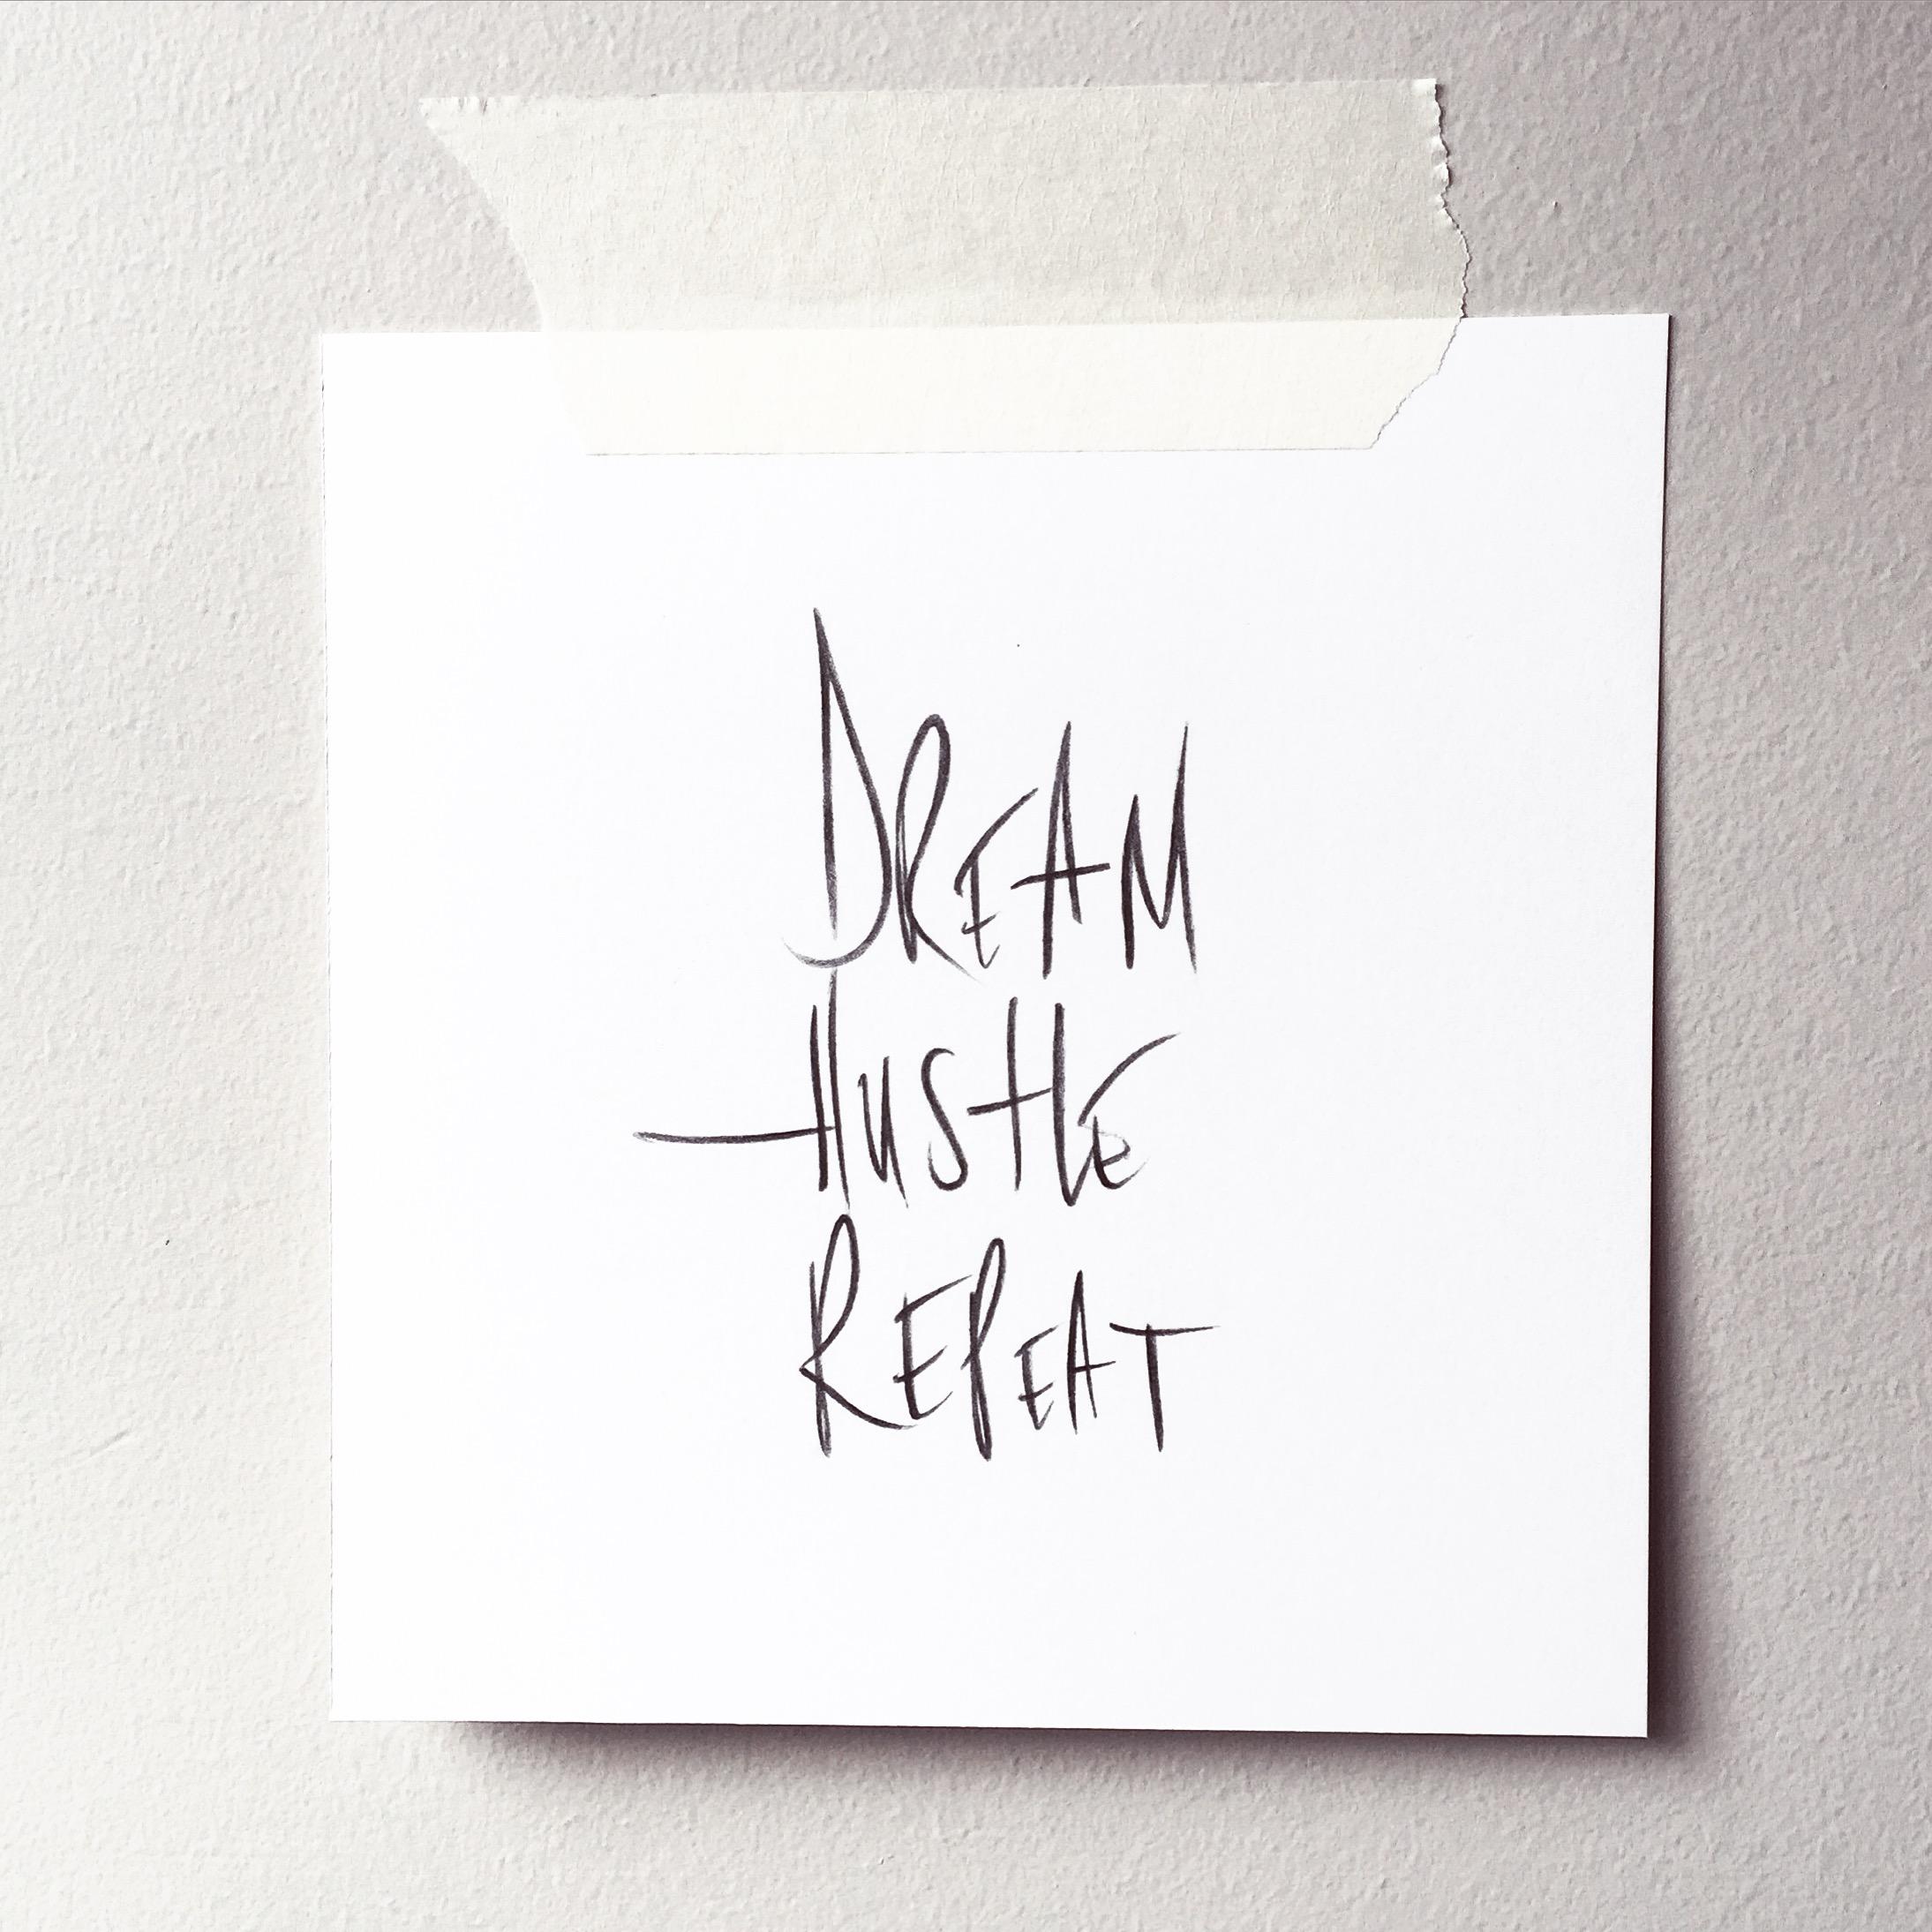 Dream. Hustle. Repeat.